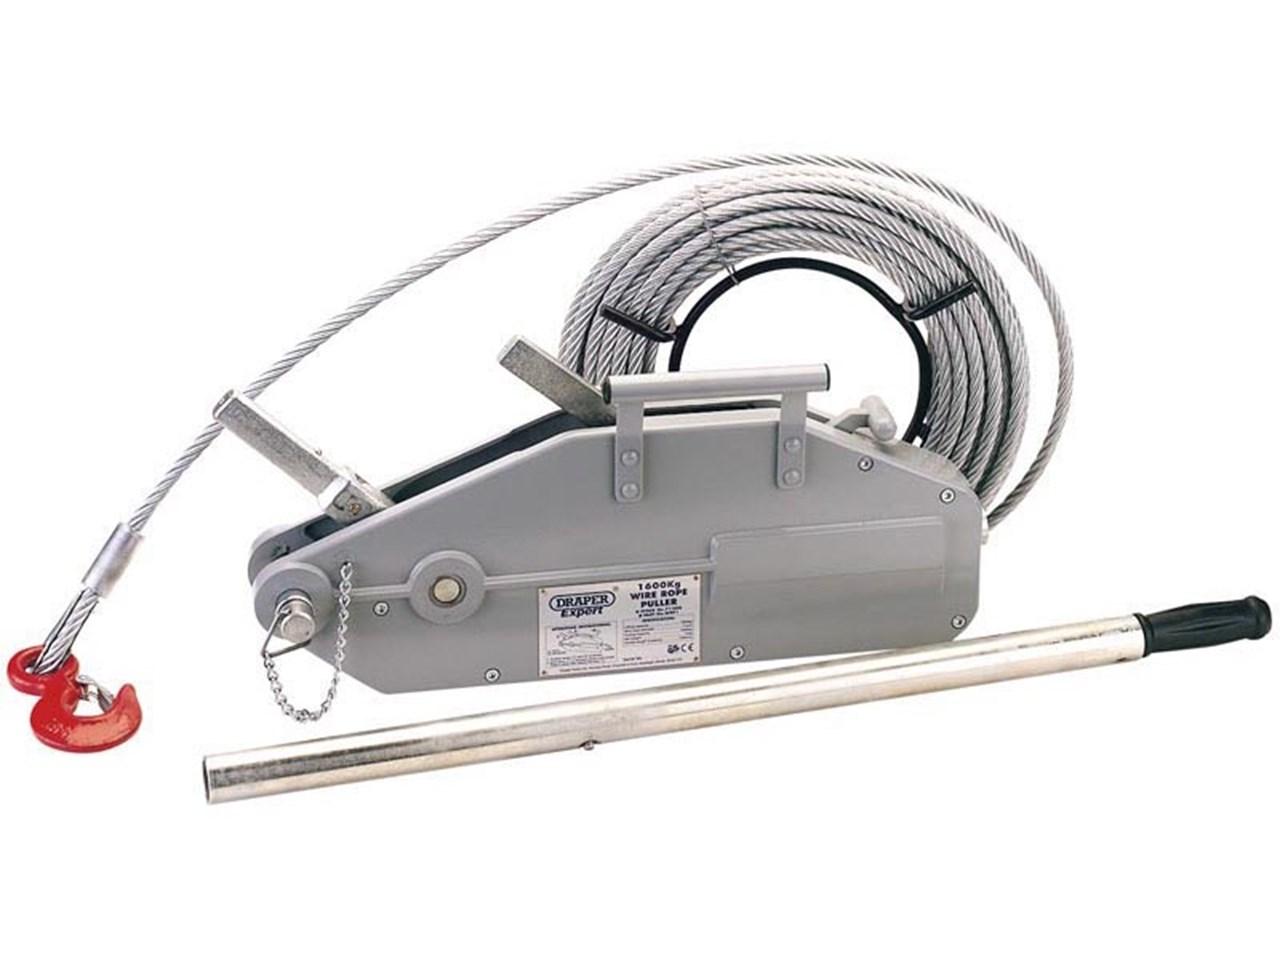 Draper WRP1 Expert 1600/2400kg Wire Rope Winch/Hoist